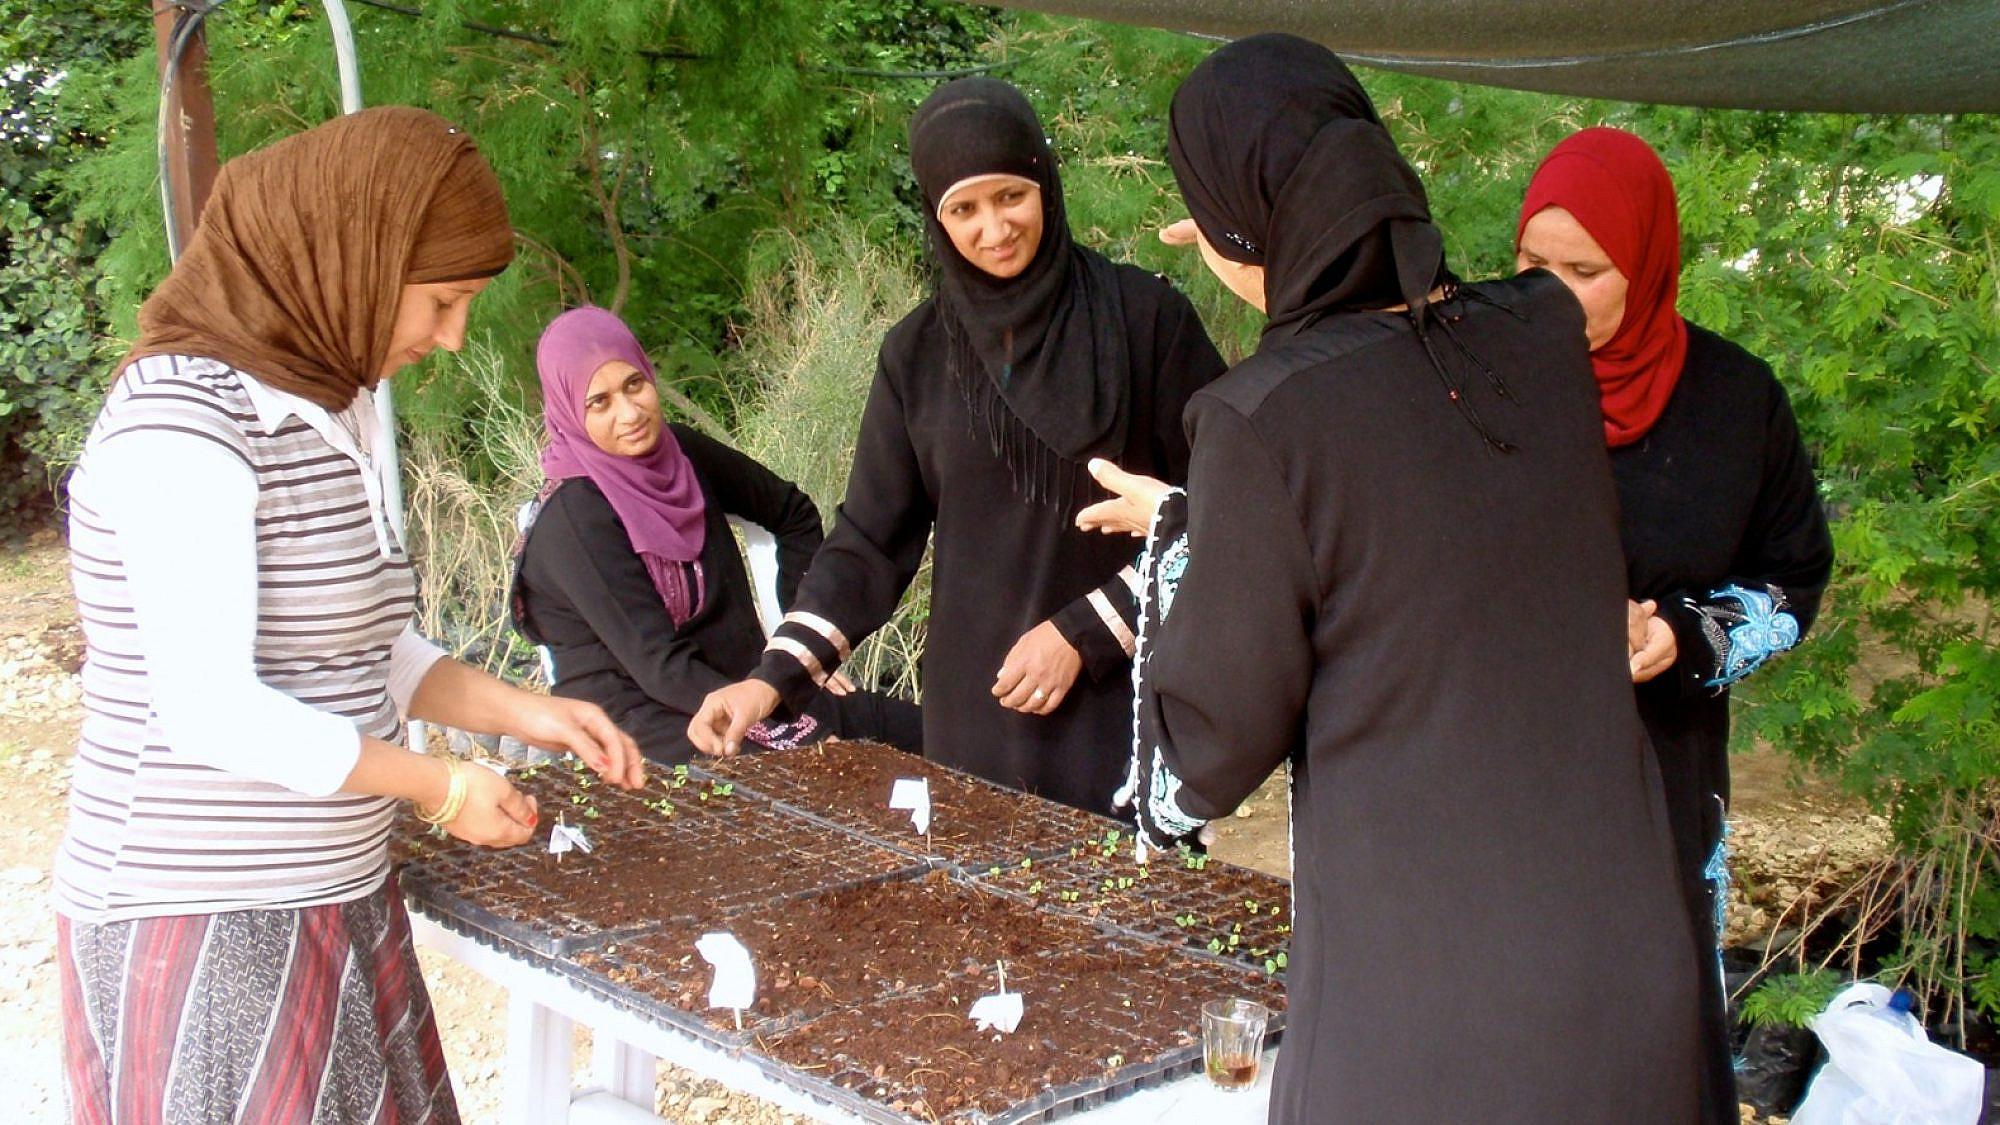 Bedouin women participating in the Wadi Attir program. Credit: Jewish National Fund.